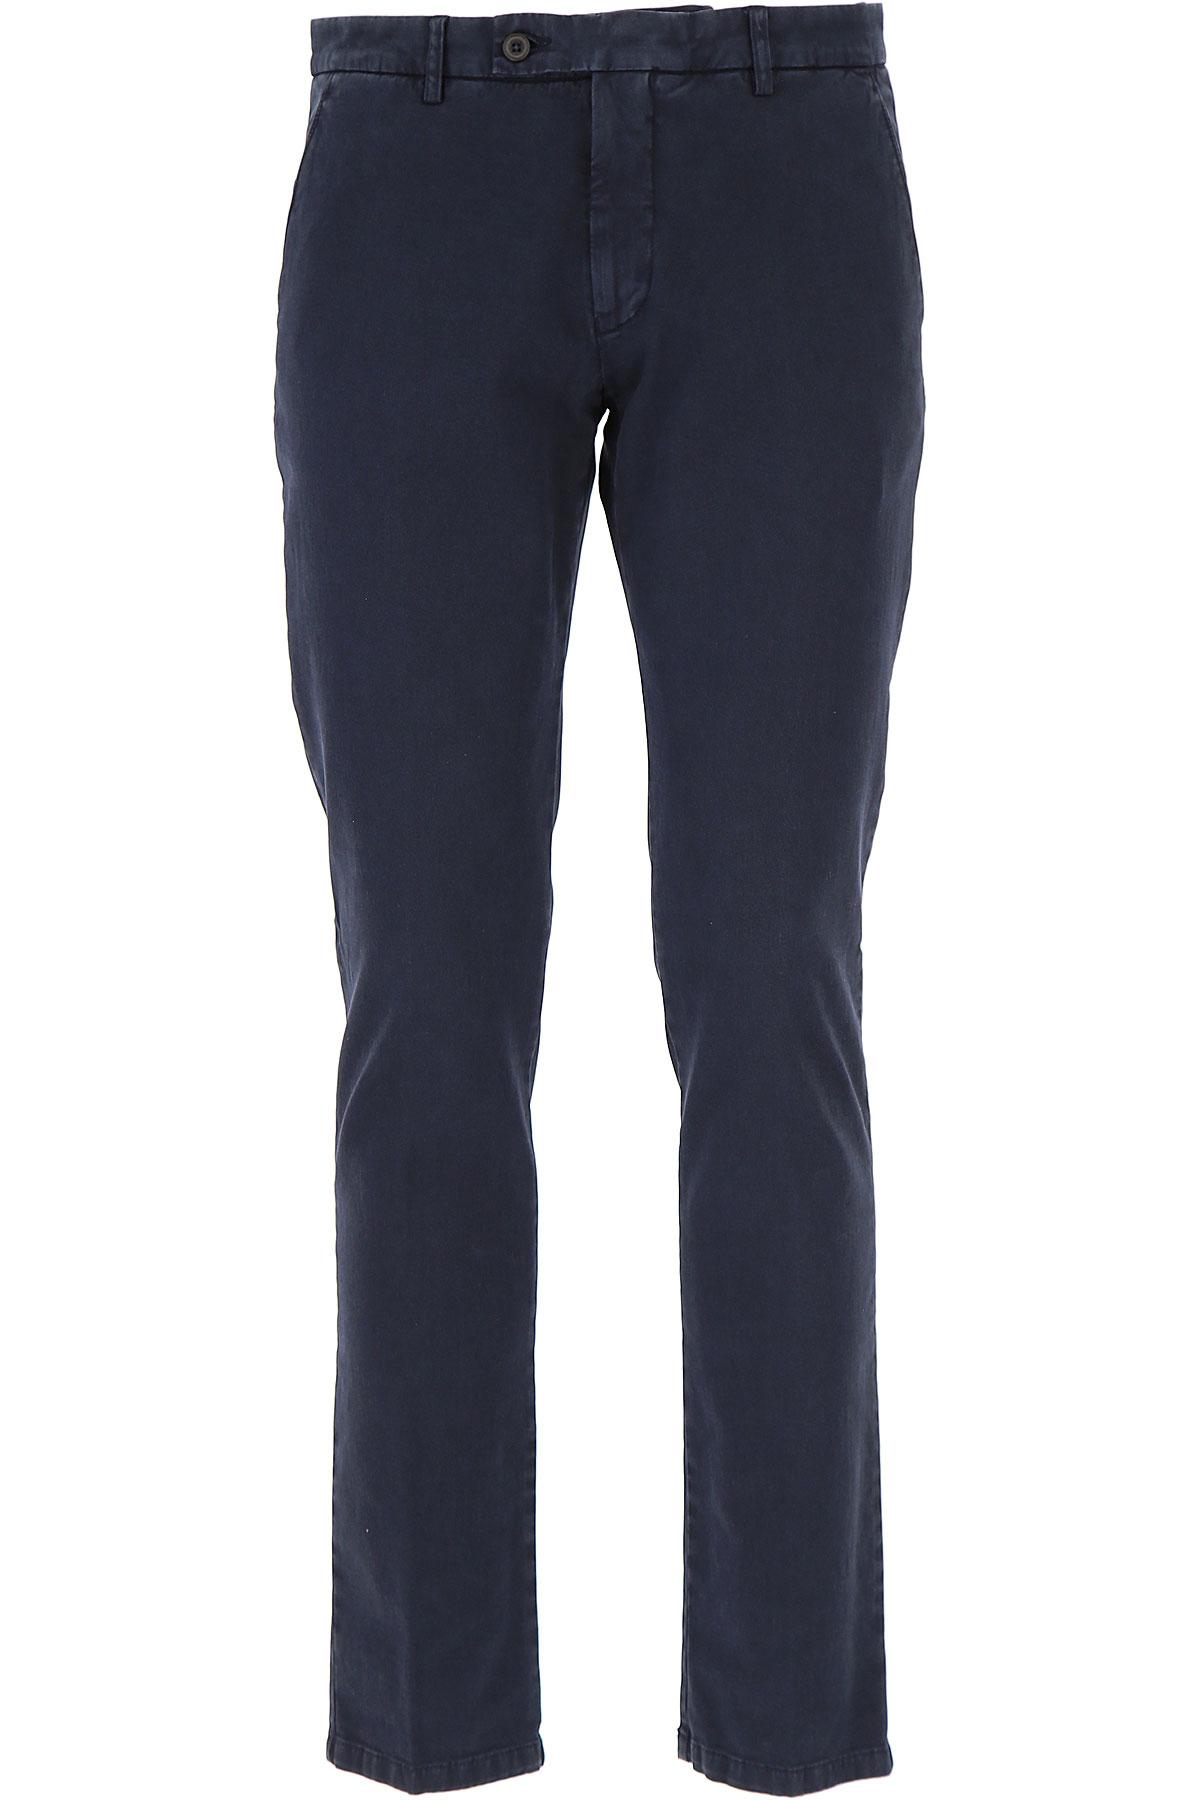 Image of Berwich Pants for Men, navy, Cotton, 2017, 30 32 36 38 40